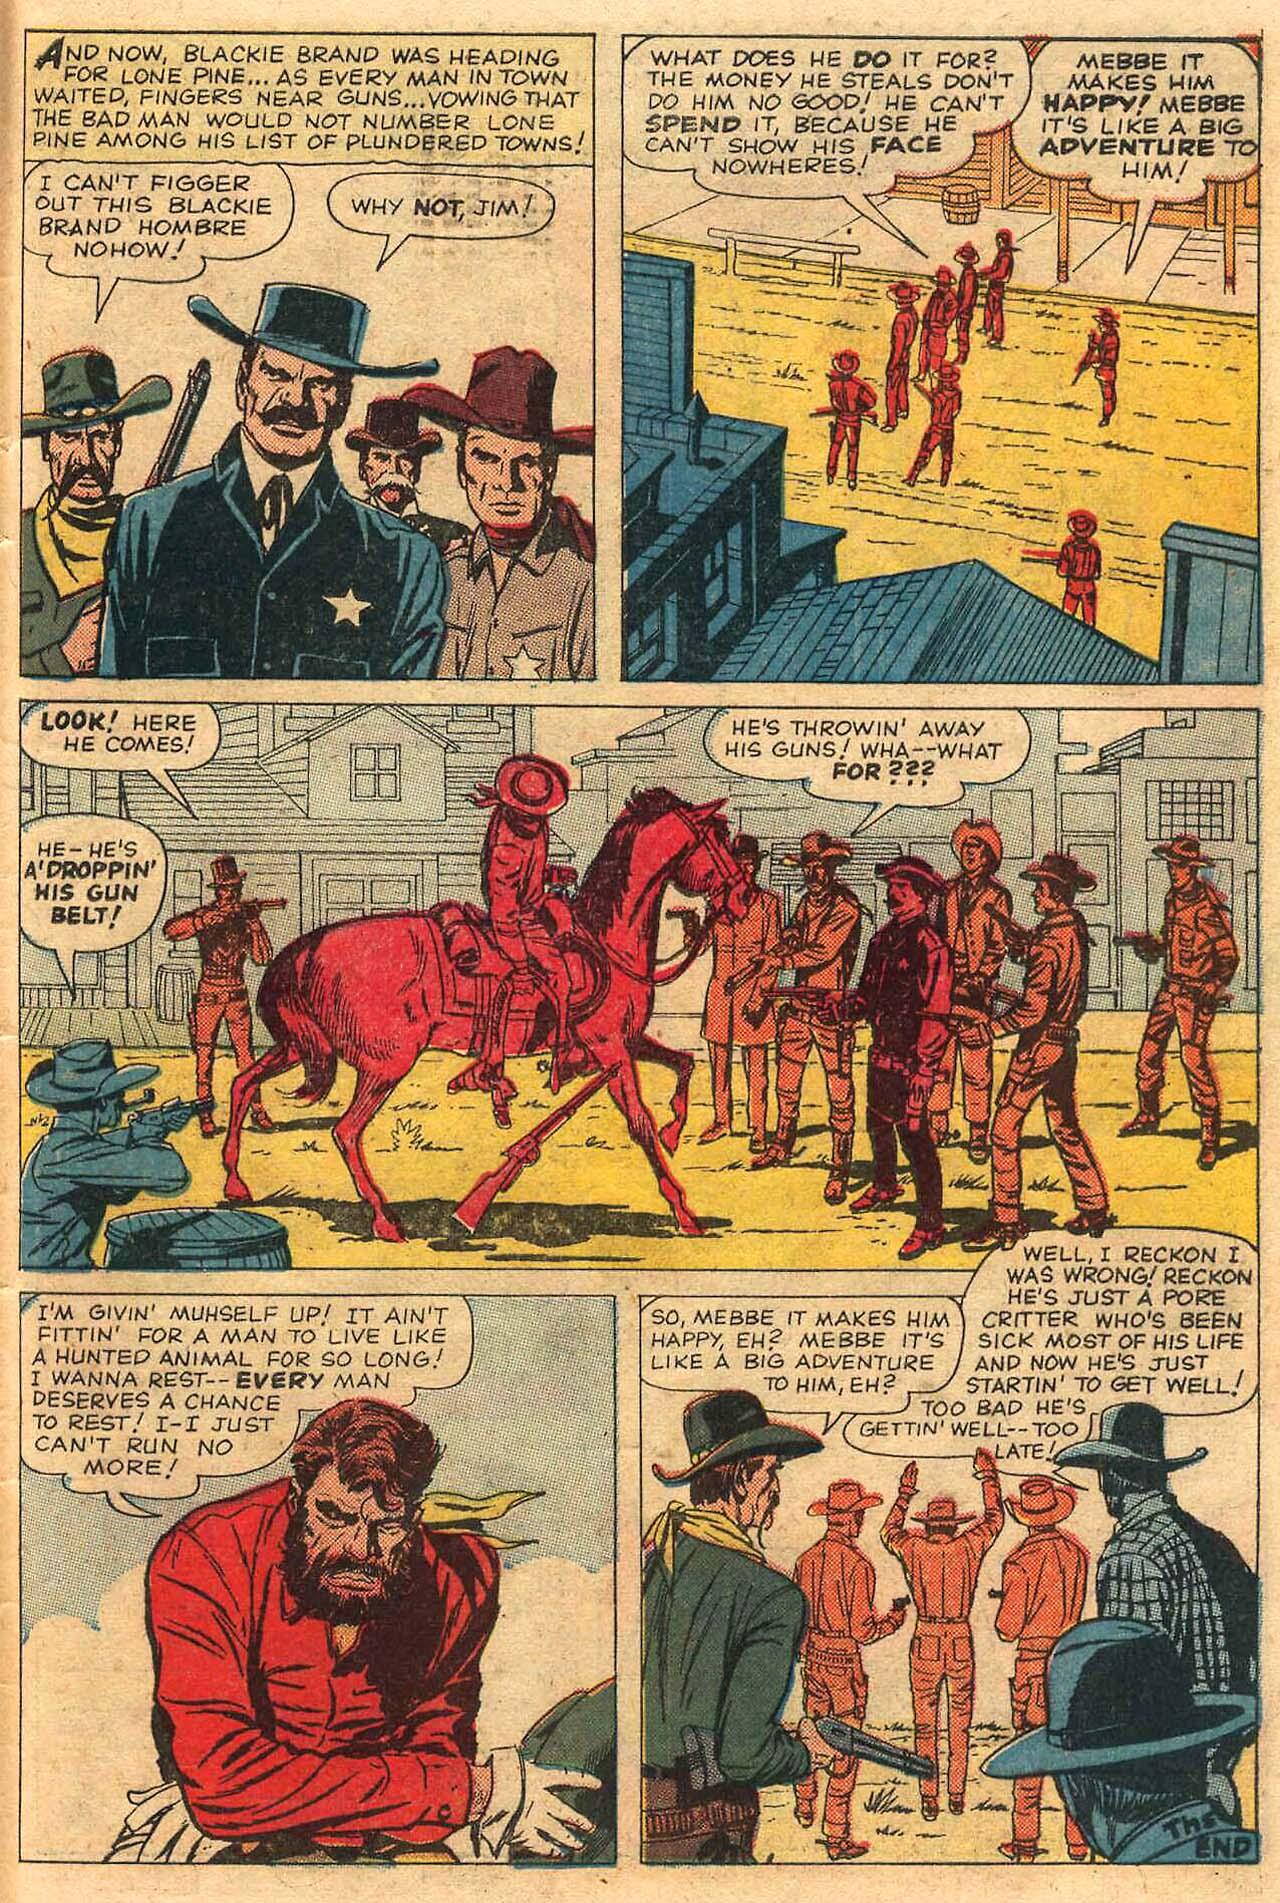 Read online Two-Gun Kid comic -  Issue #77 - 31